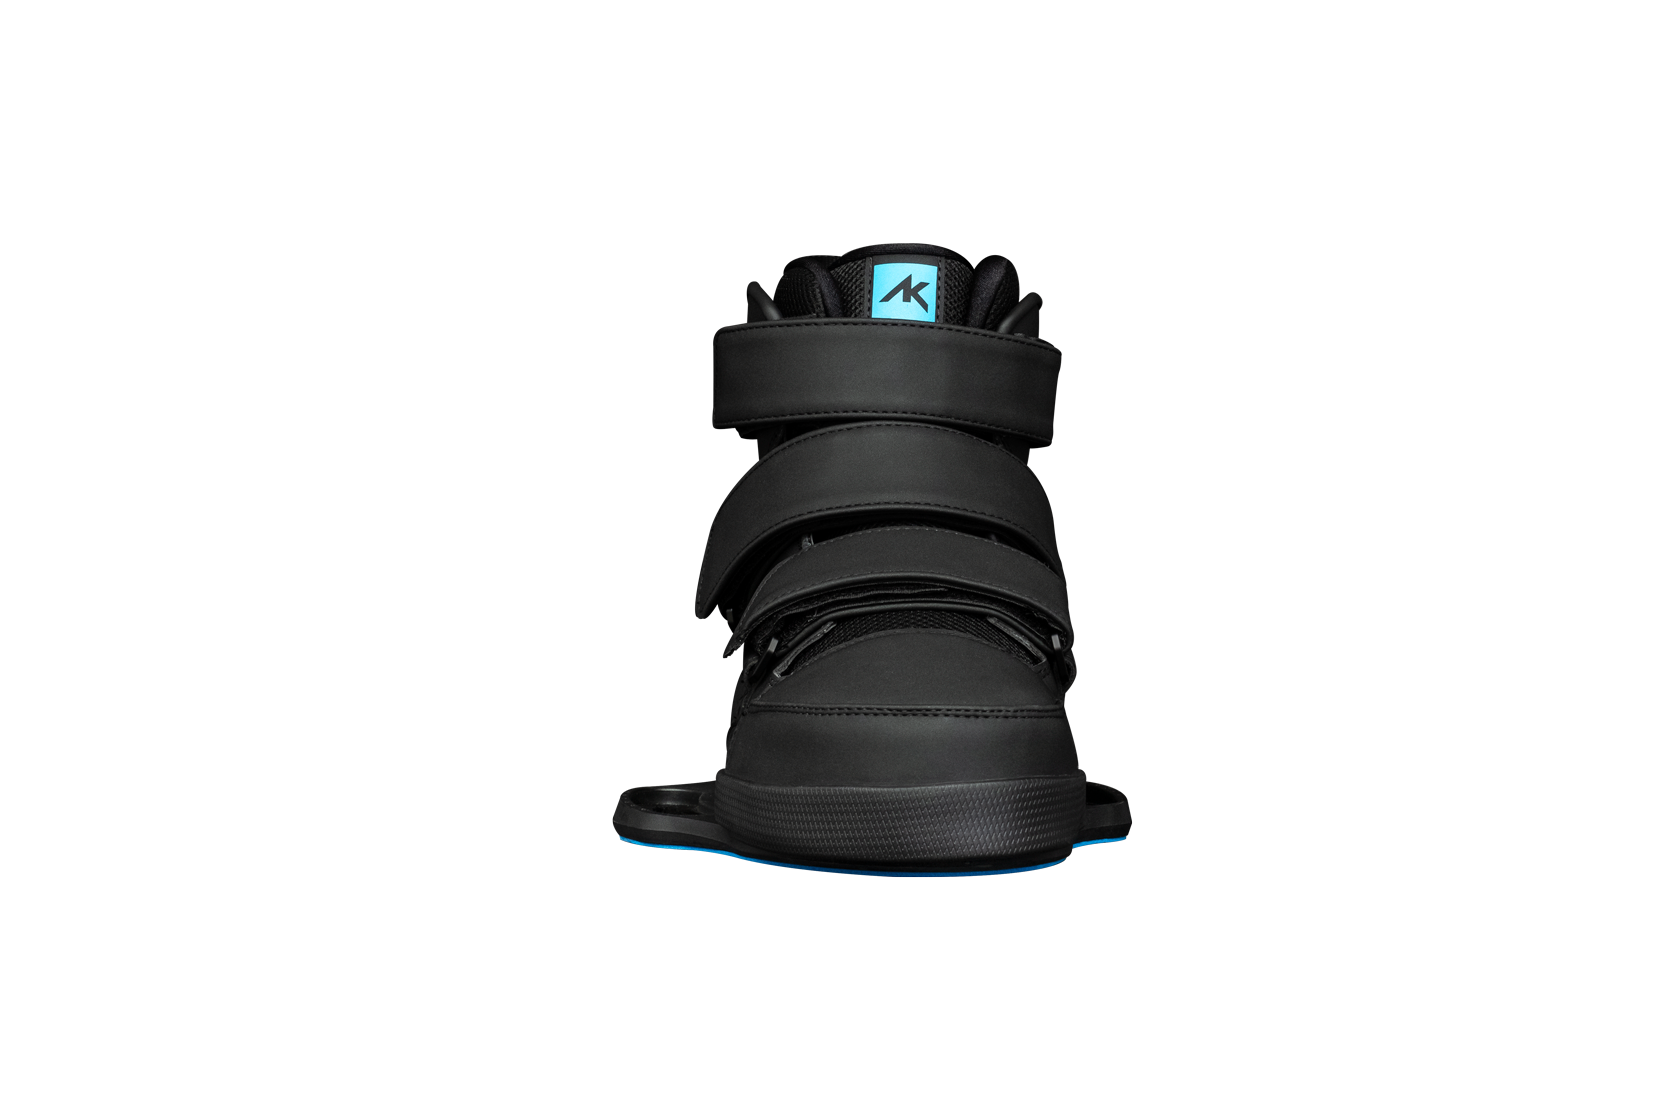 21_AK_Static Boot_img-02